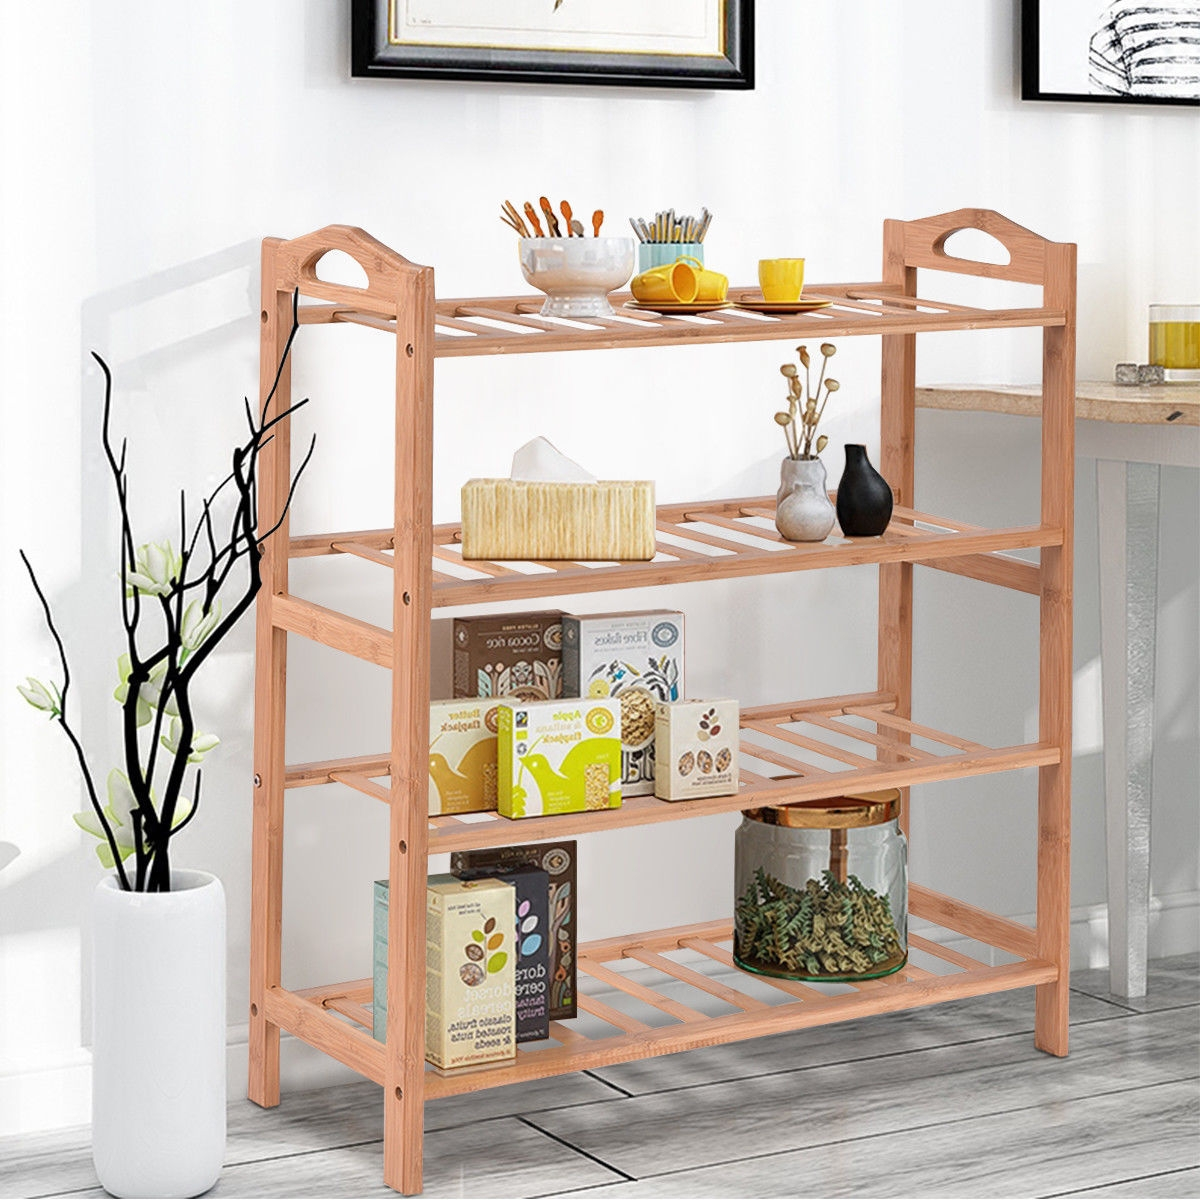 4 Tier Bamboo Shoe Shelf Storage Organizer